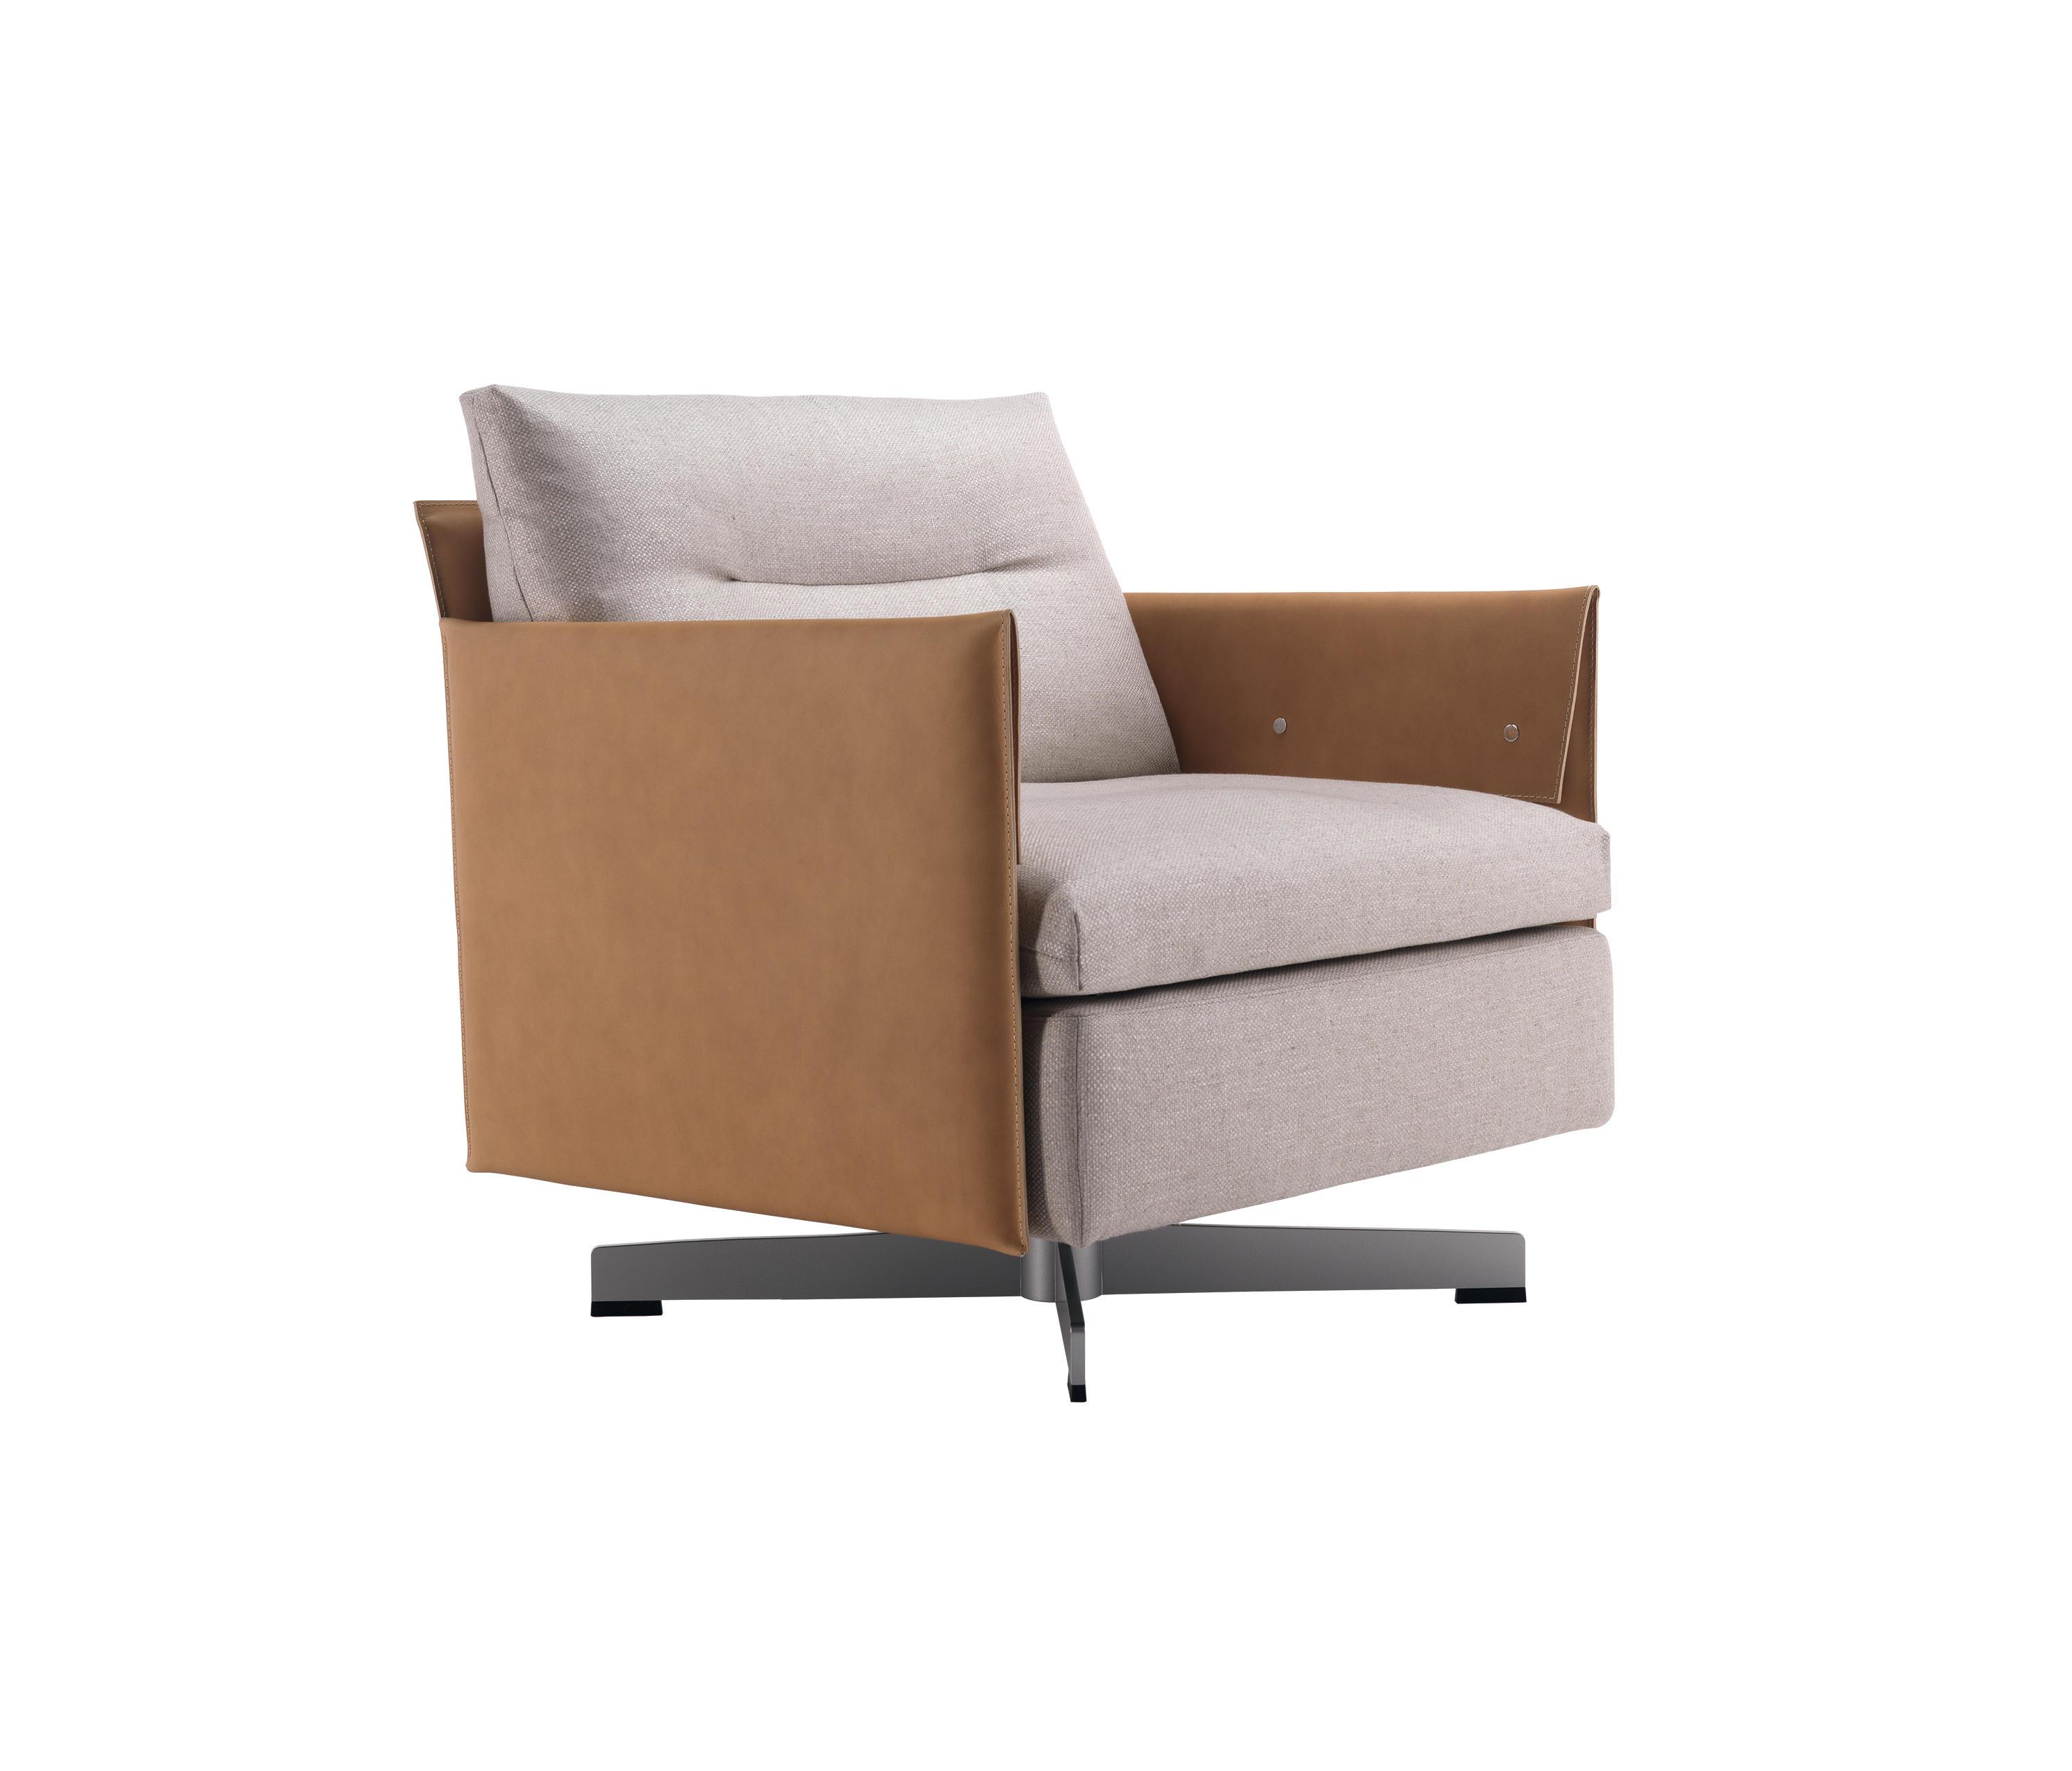 Grantorino Armchair Sessel Von Poltrona Frau Architonic